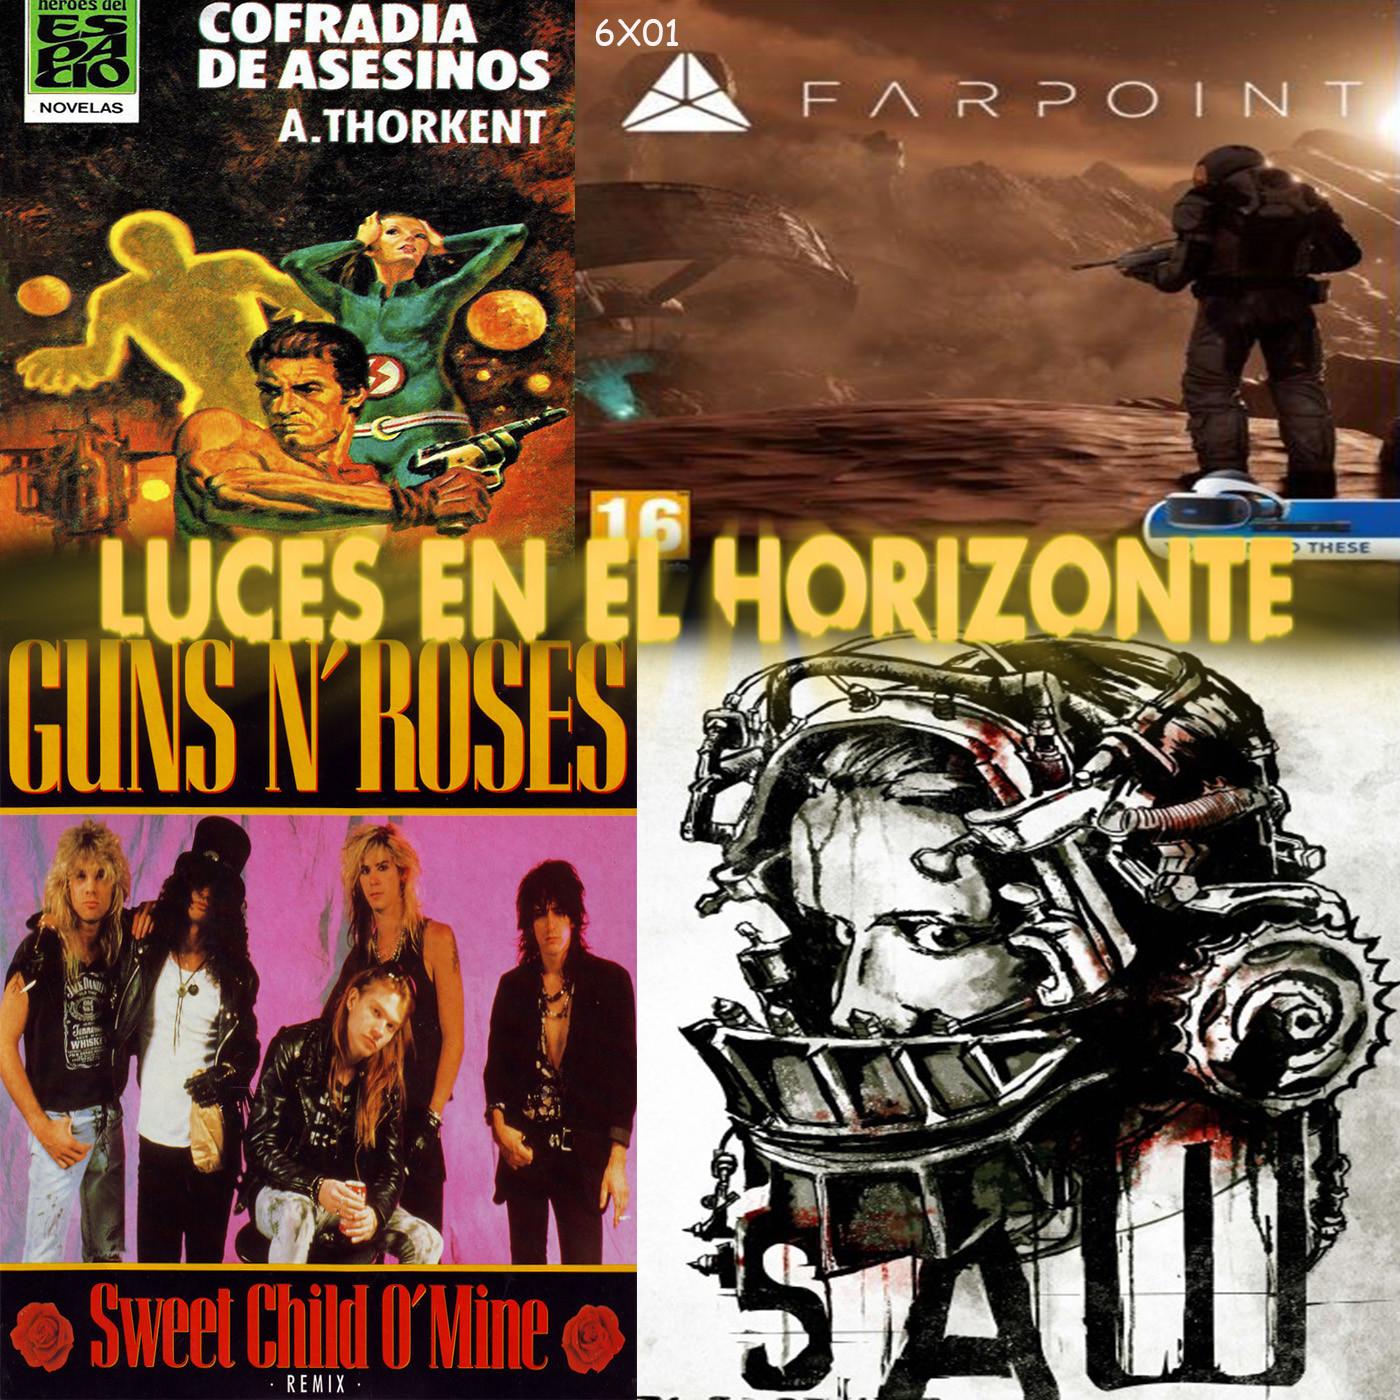 Luces en el Horizonte 6X01: SAW, SWEET CHILD O´MINE, FARPOINT, COFRADÍA DE ASESINOS